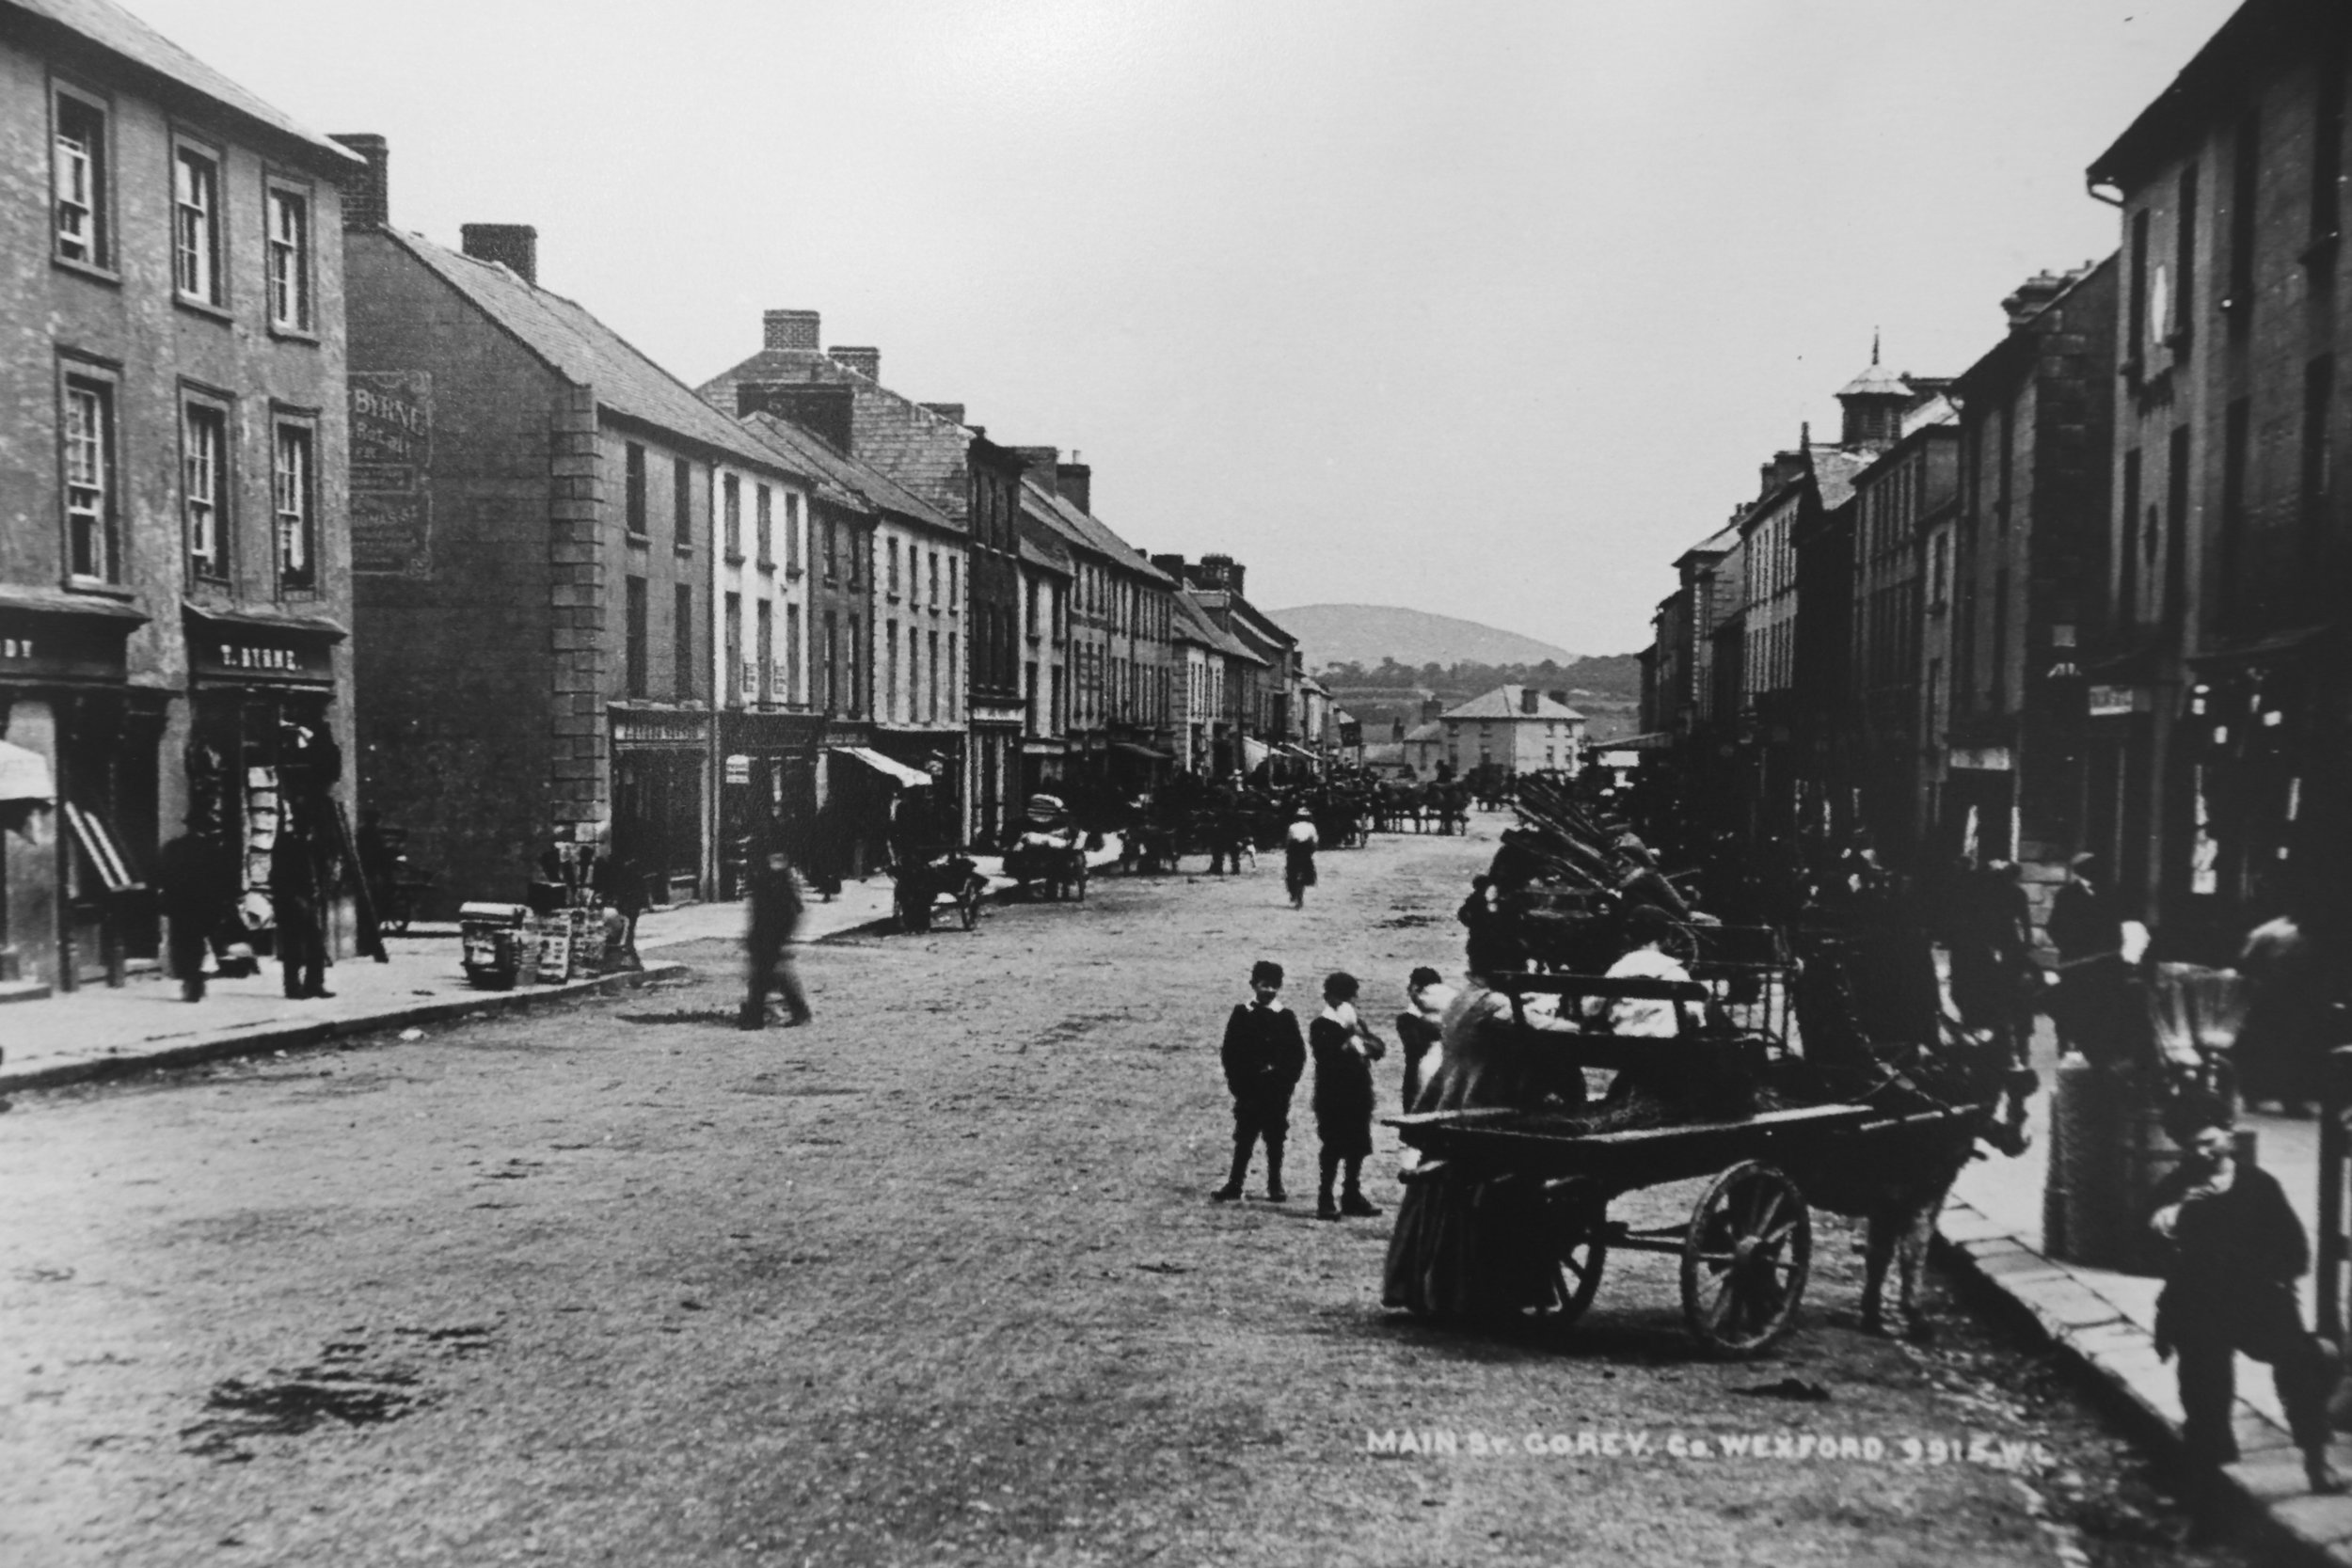 Gorey Main Street